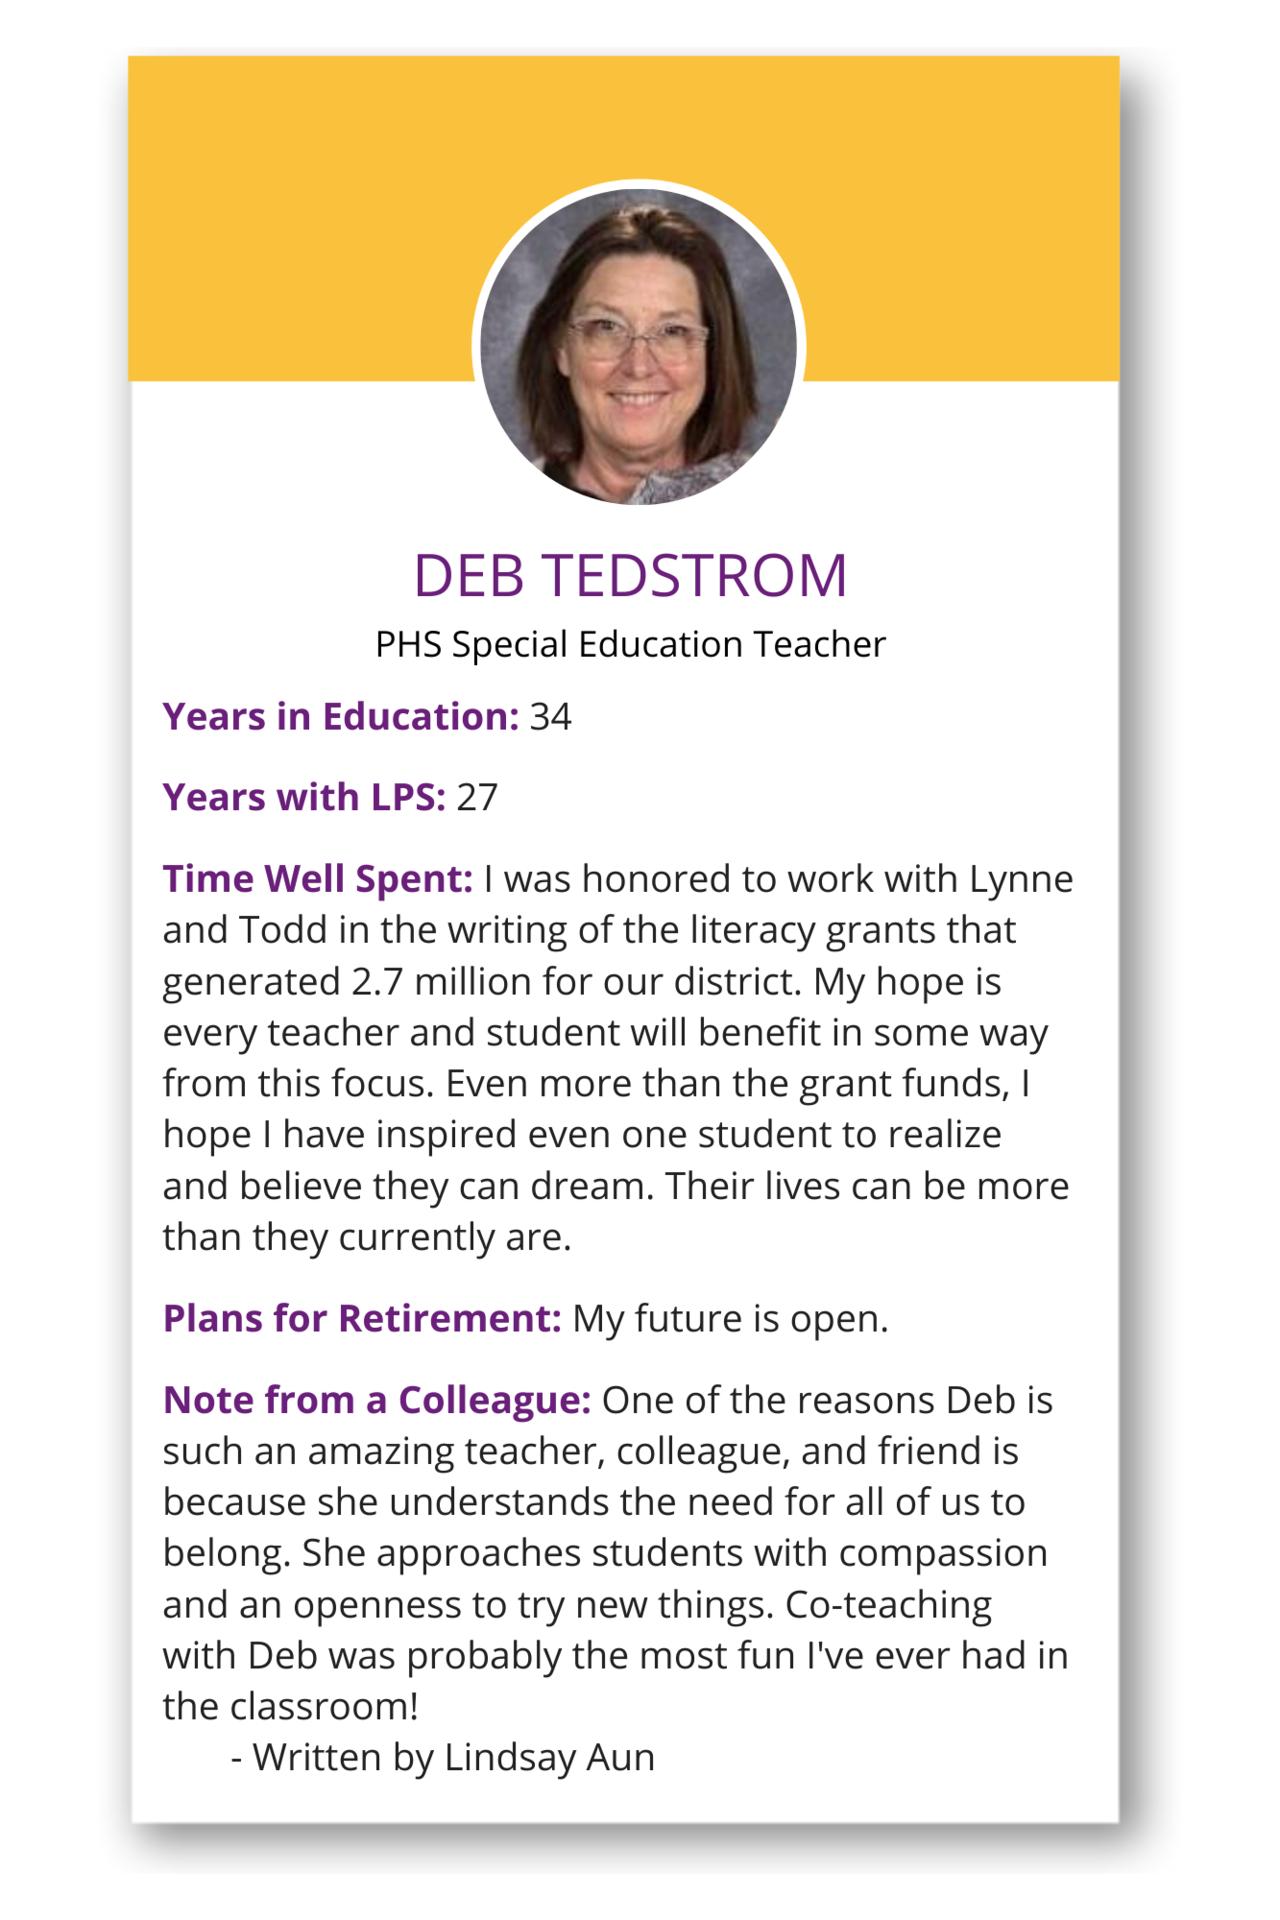 Deb Tedstrom Tile